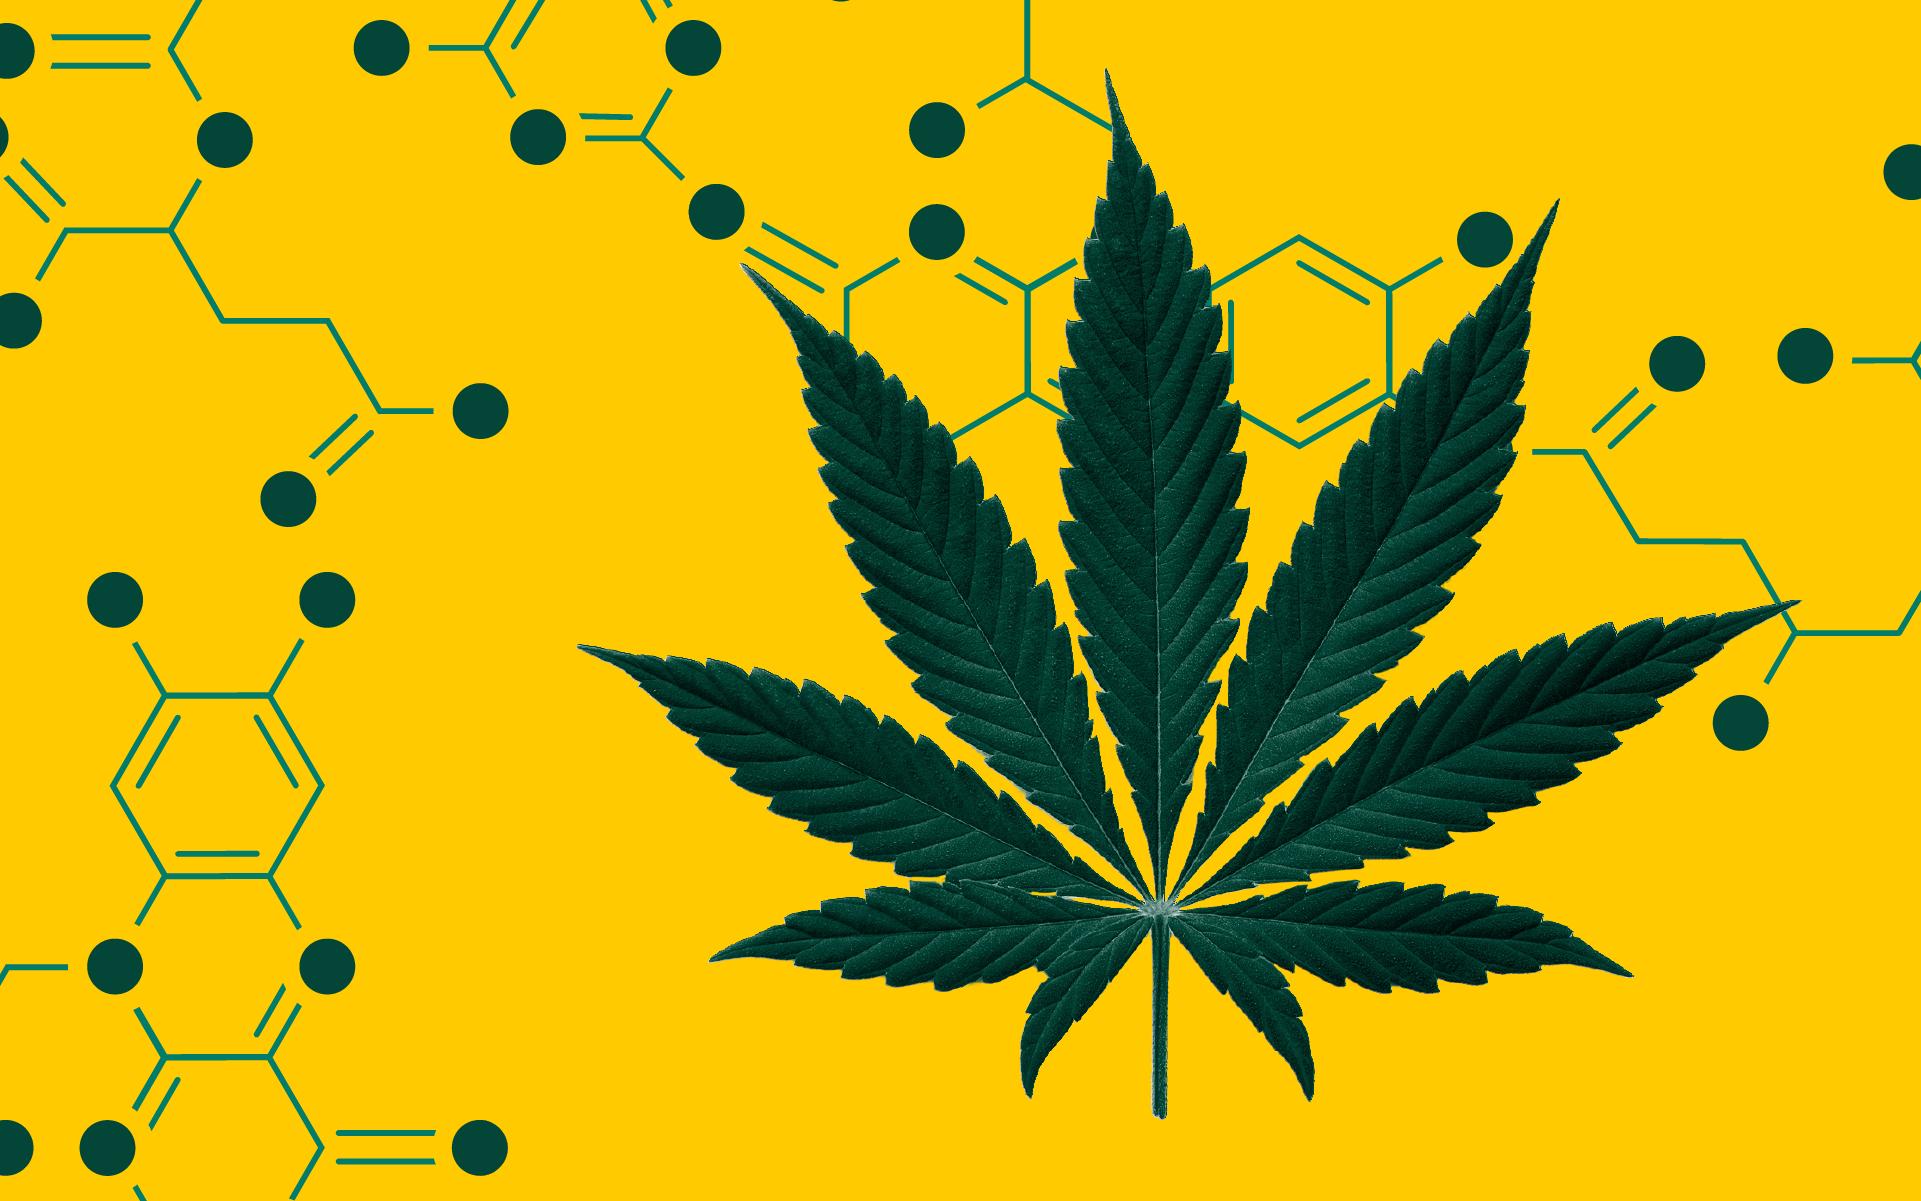 cannabinoids, thc, cbd, thcp, cbdp, brain chemistry and cannabis